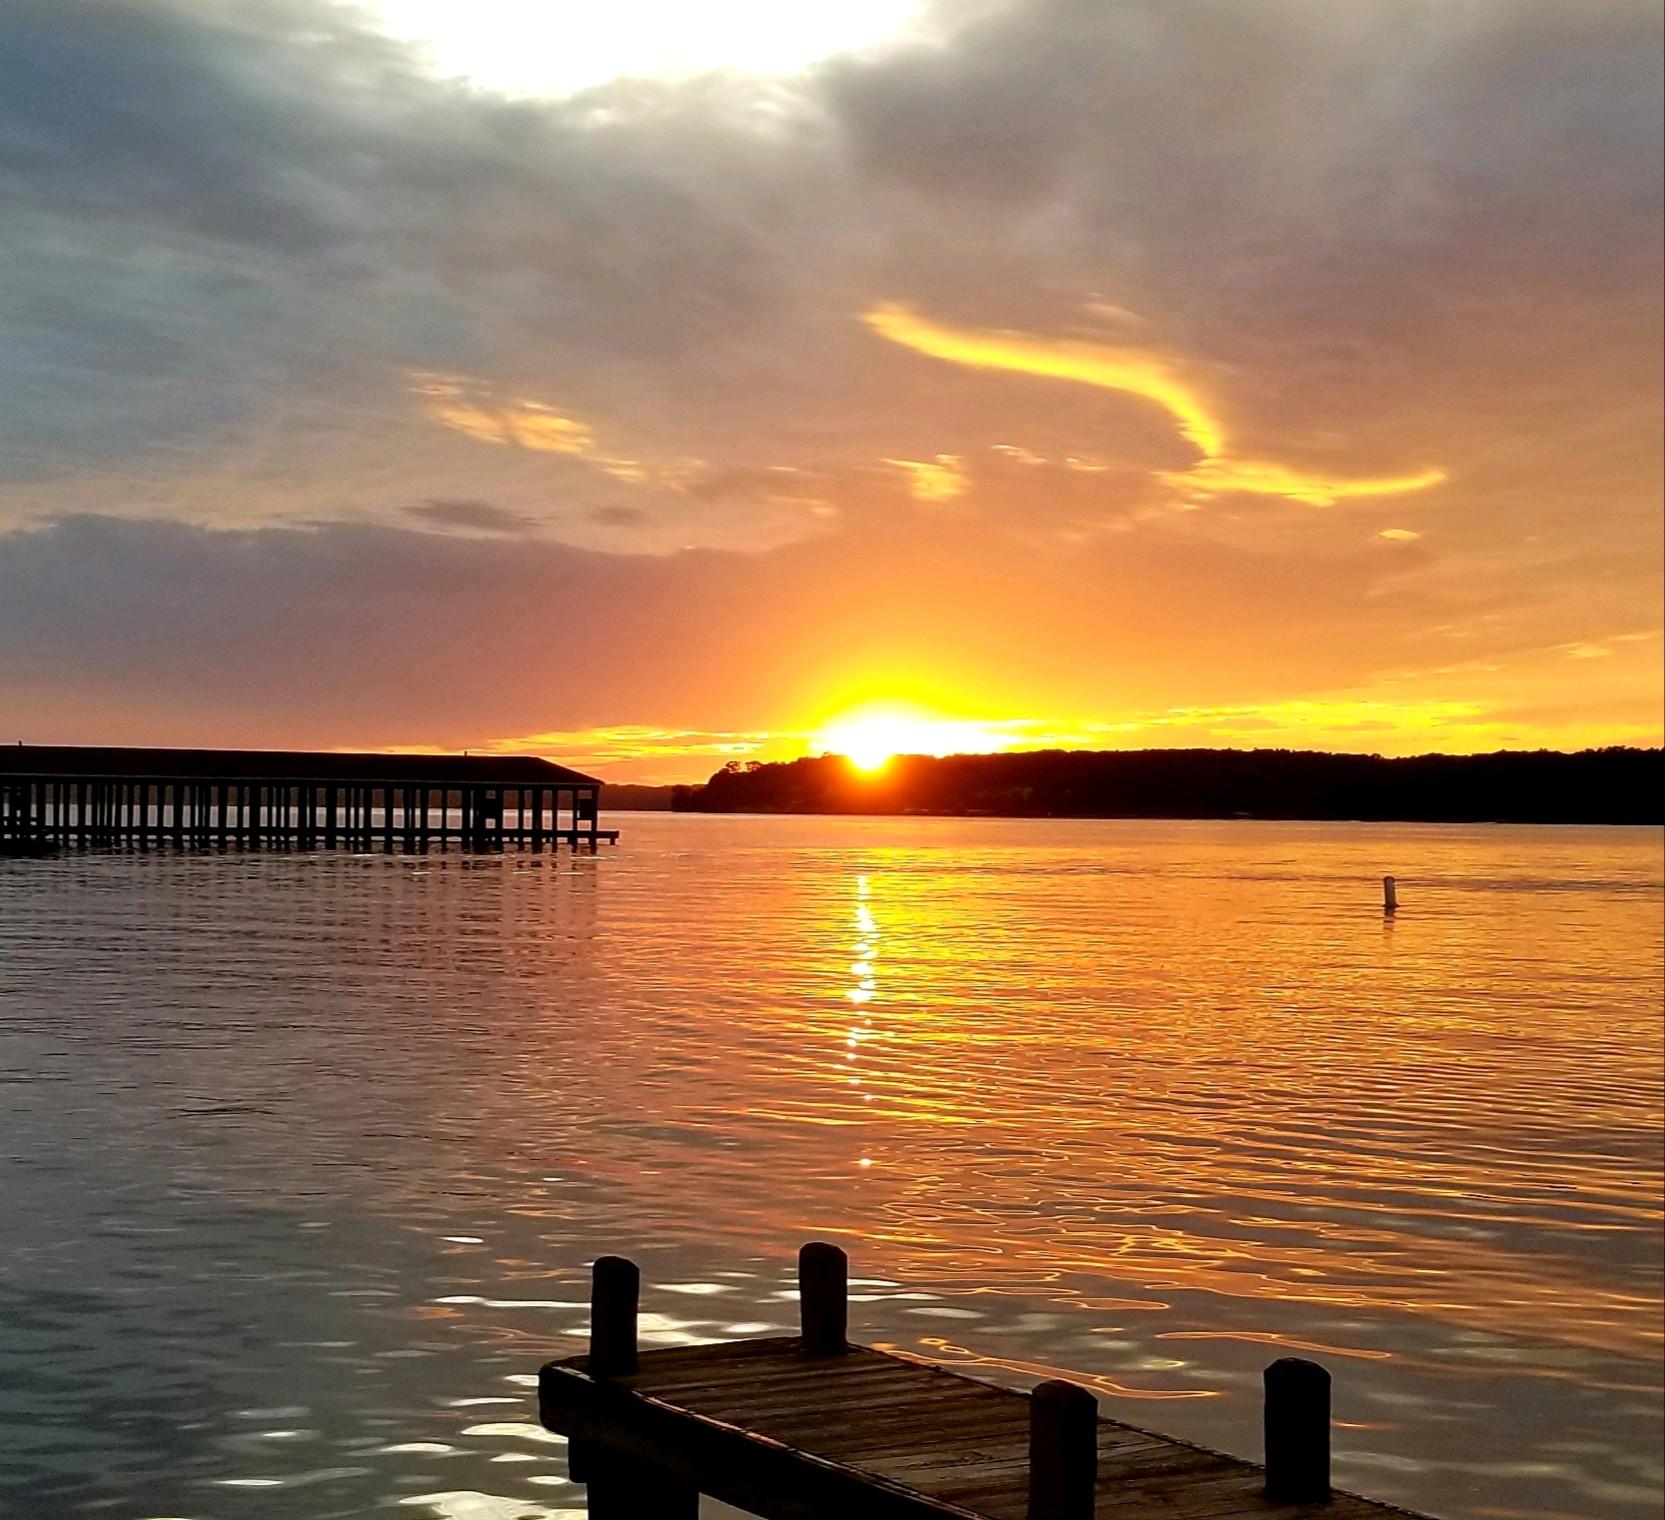 sunset over docks on lake Gaston